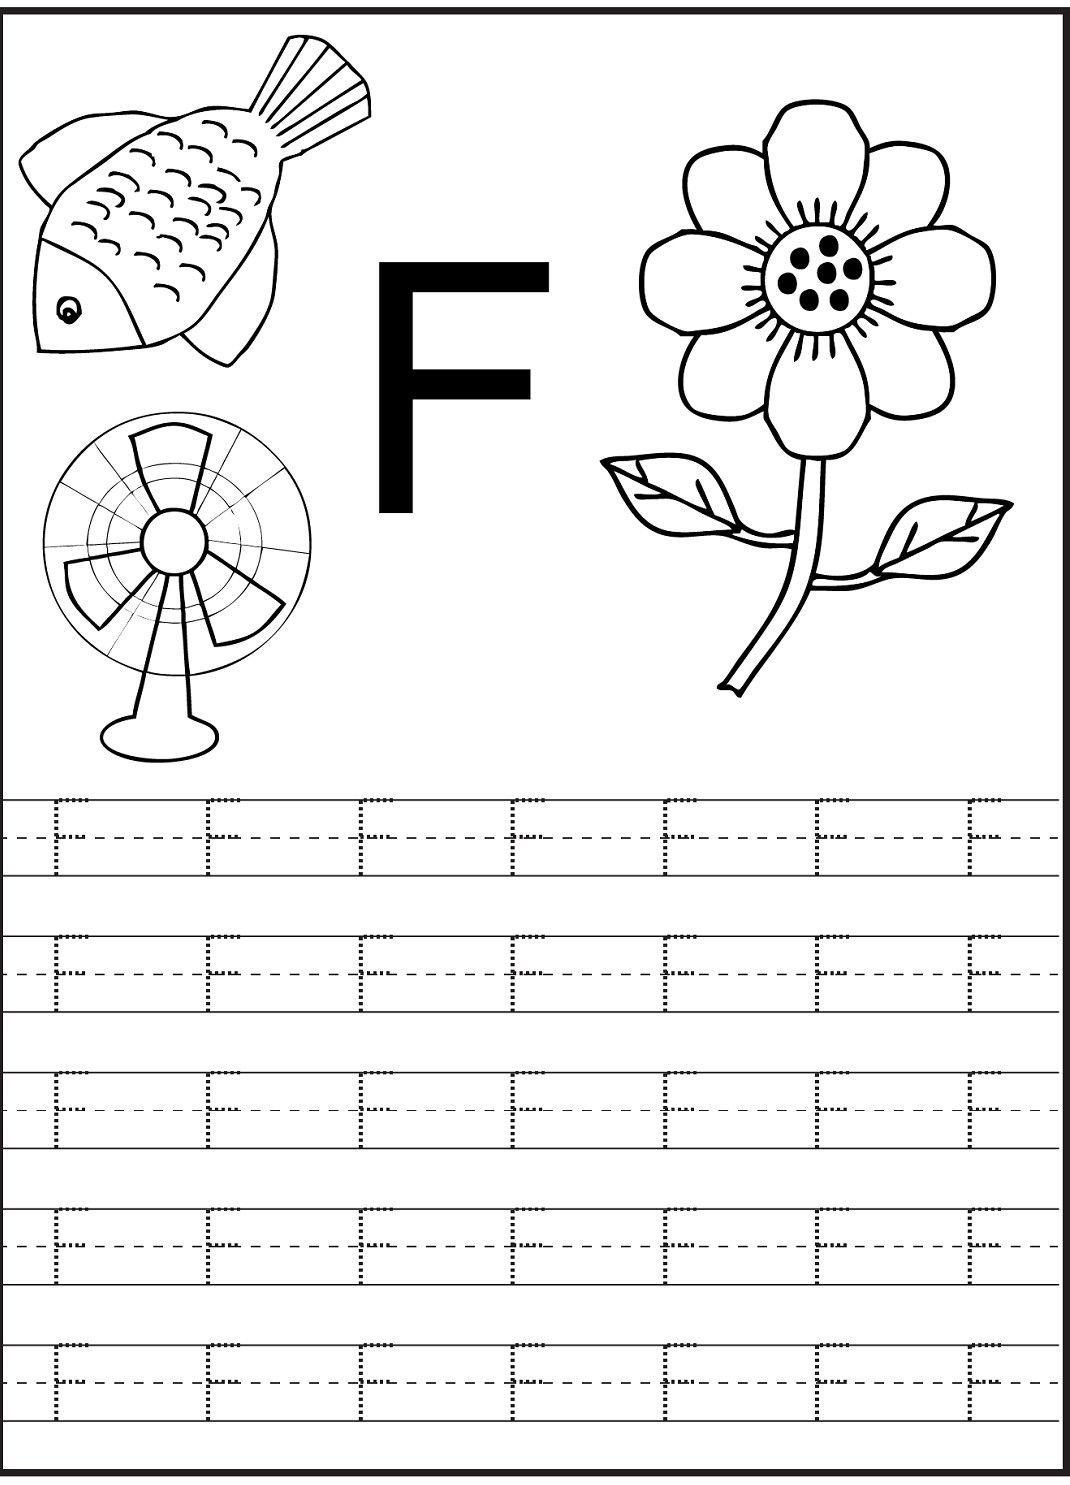 29 Letter F Preschool Printable Worksheets Coloring